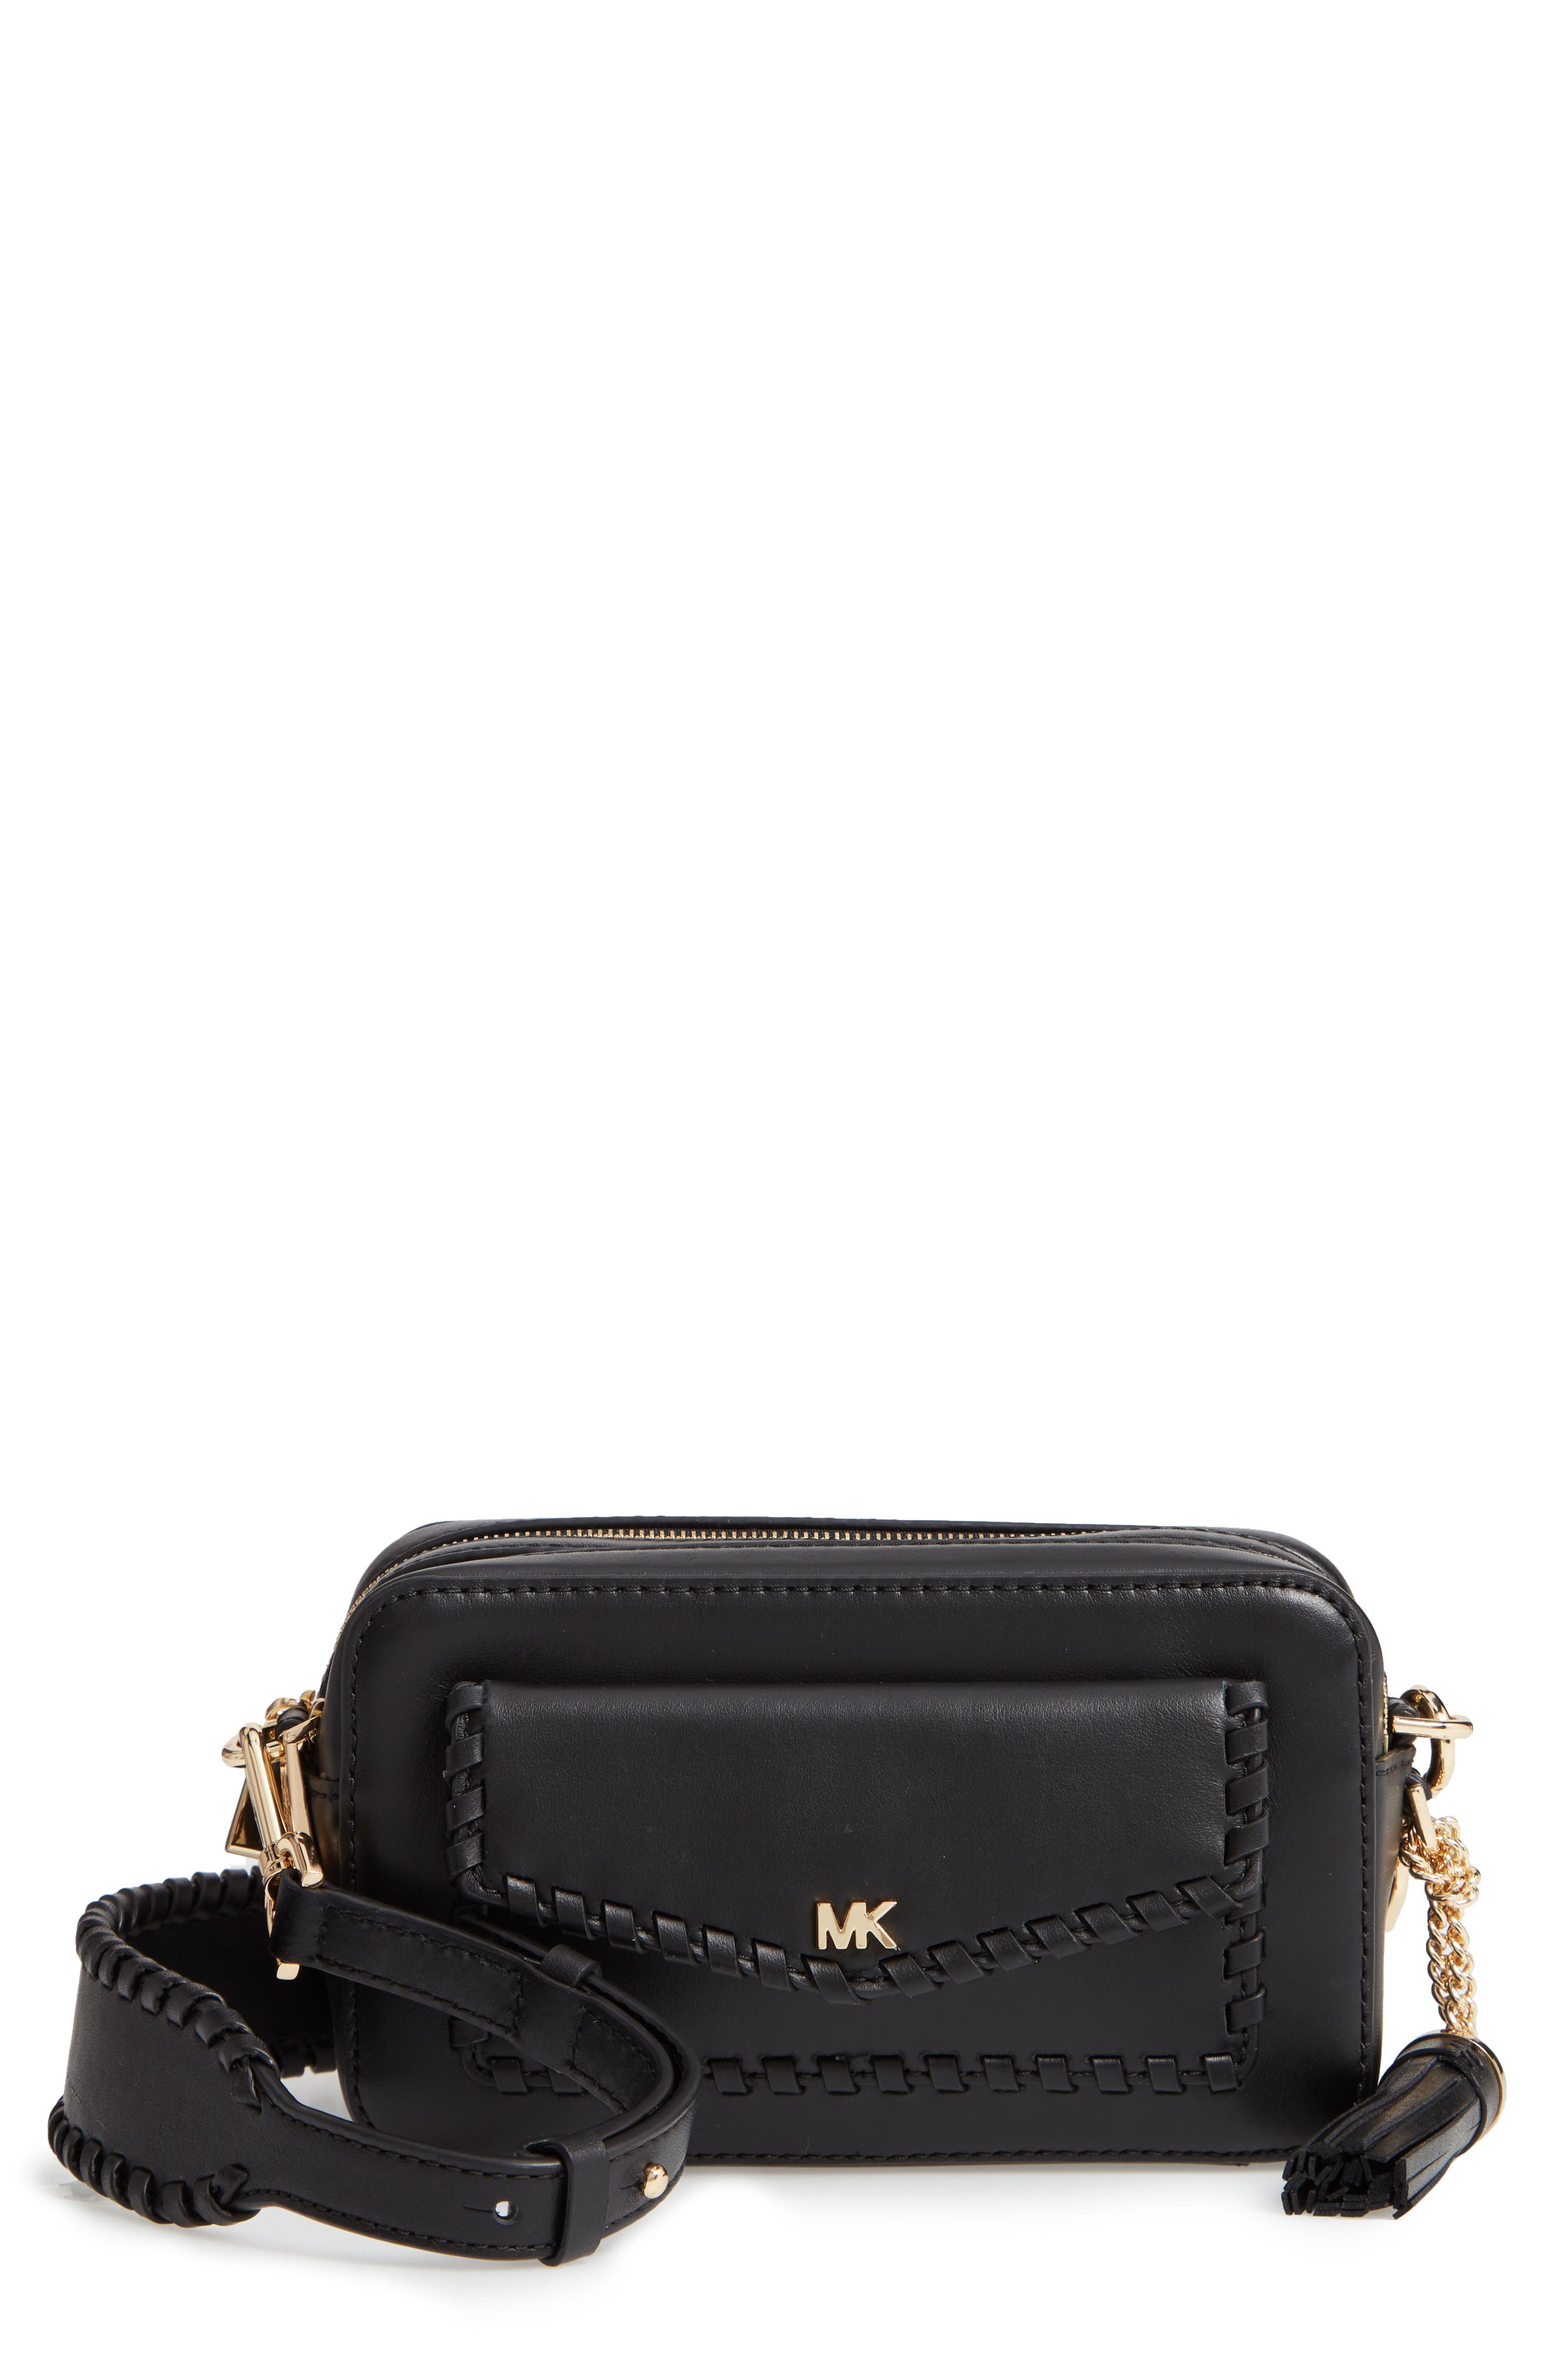 michael michael kors handbags wallets for women nordstrom rh shop nordstrom com michael kors handbags at nordstrom michael kors wallet wristlet nordstrom